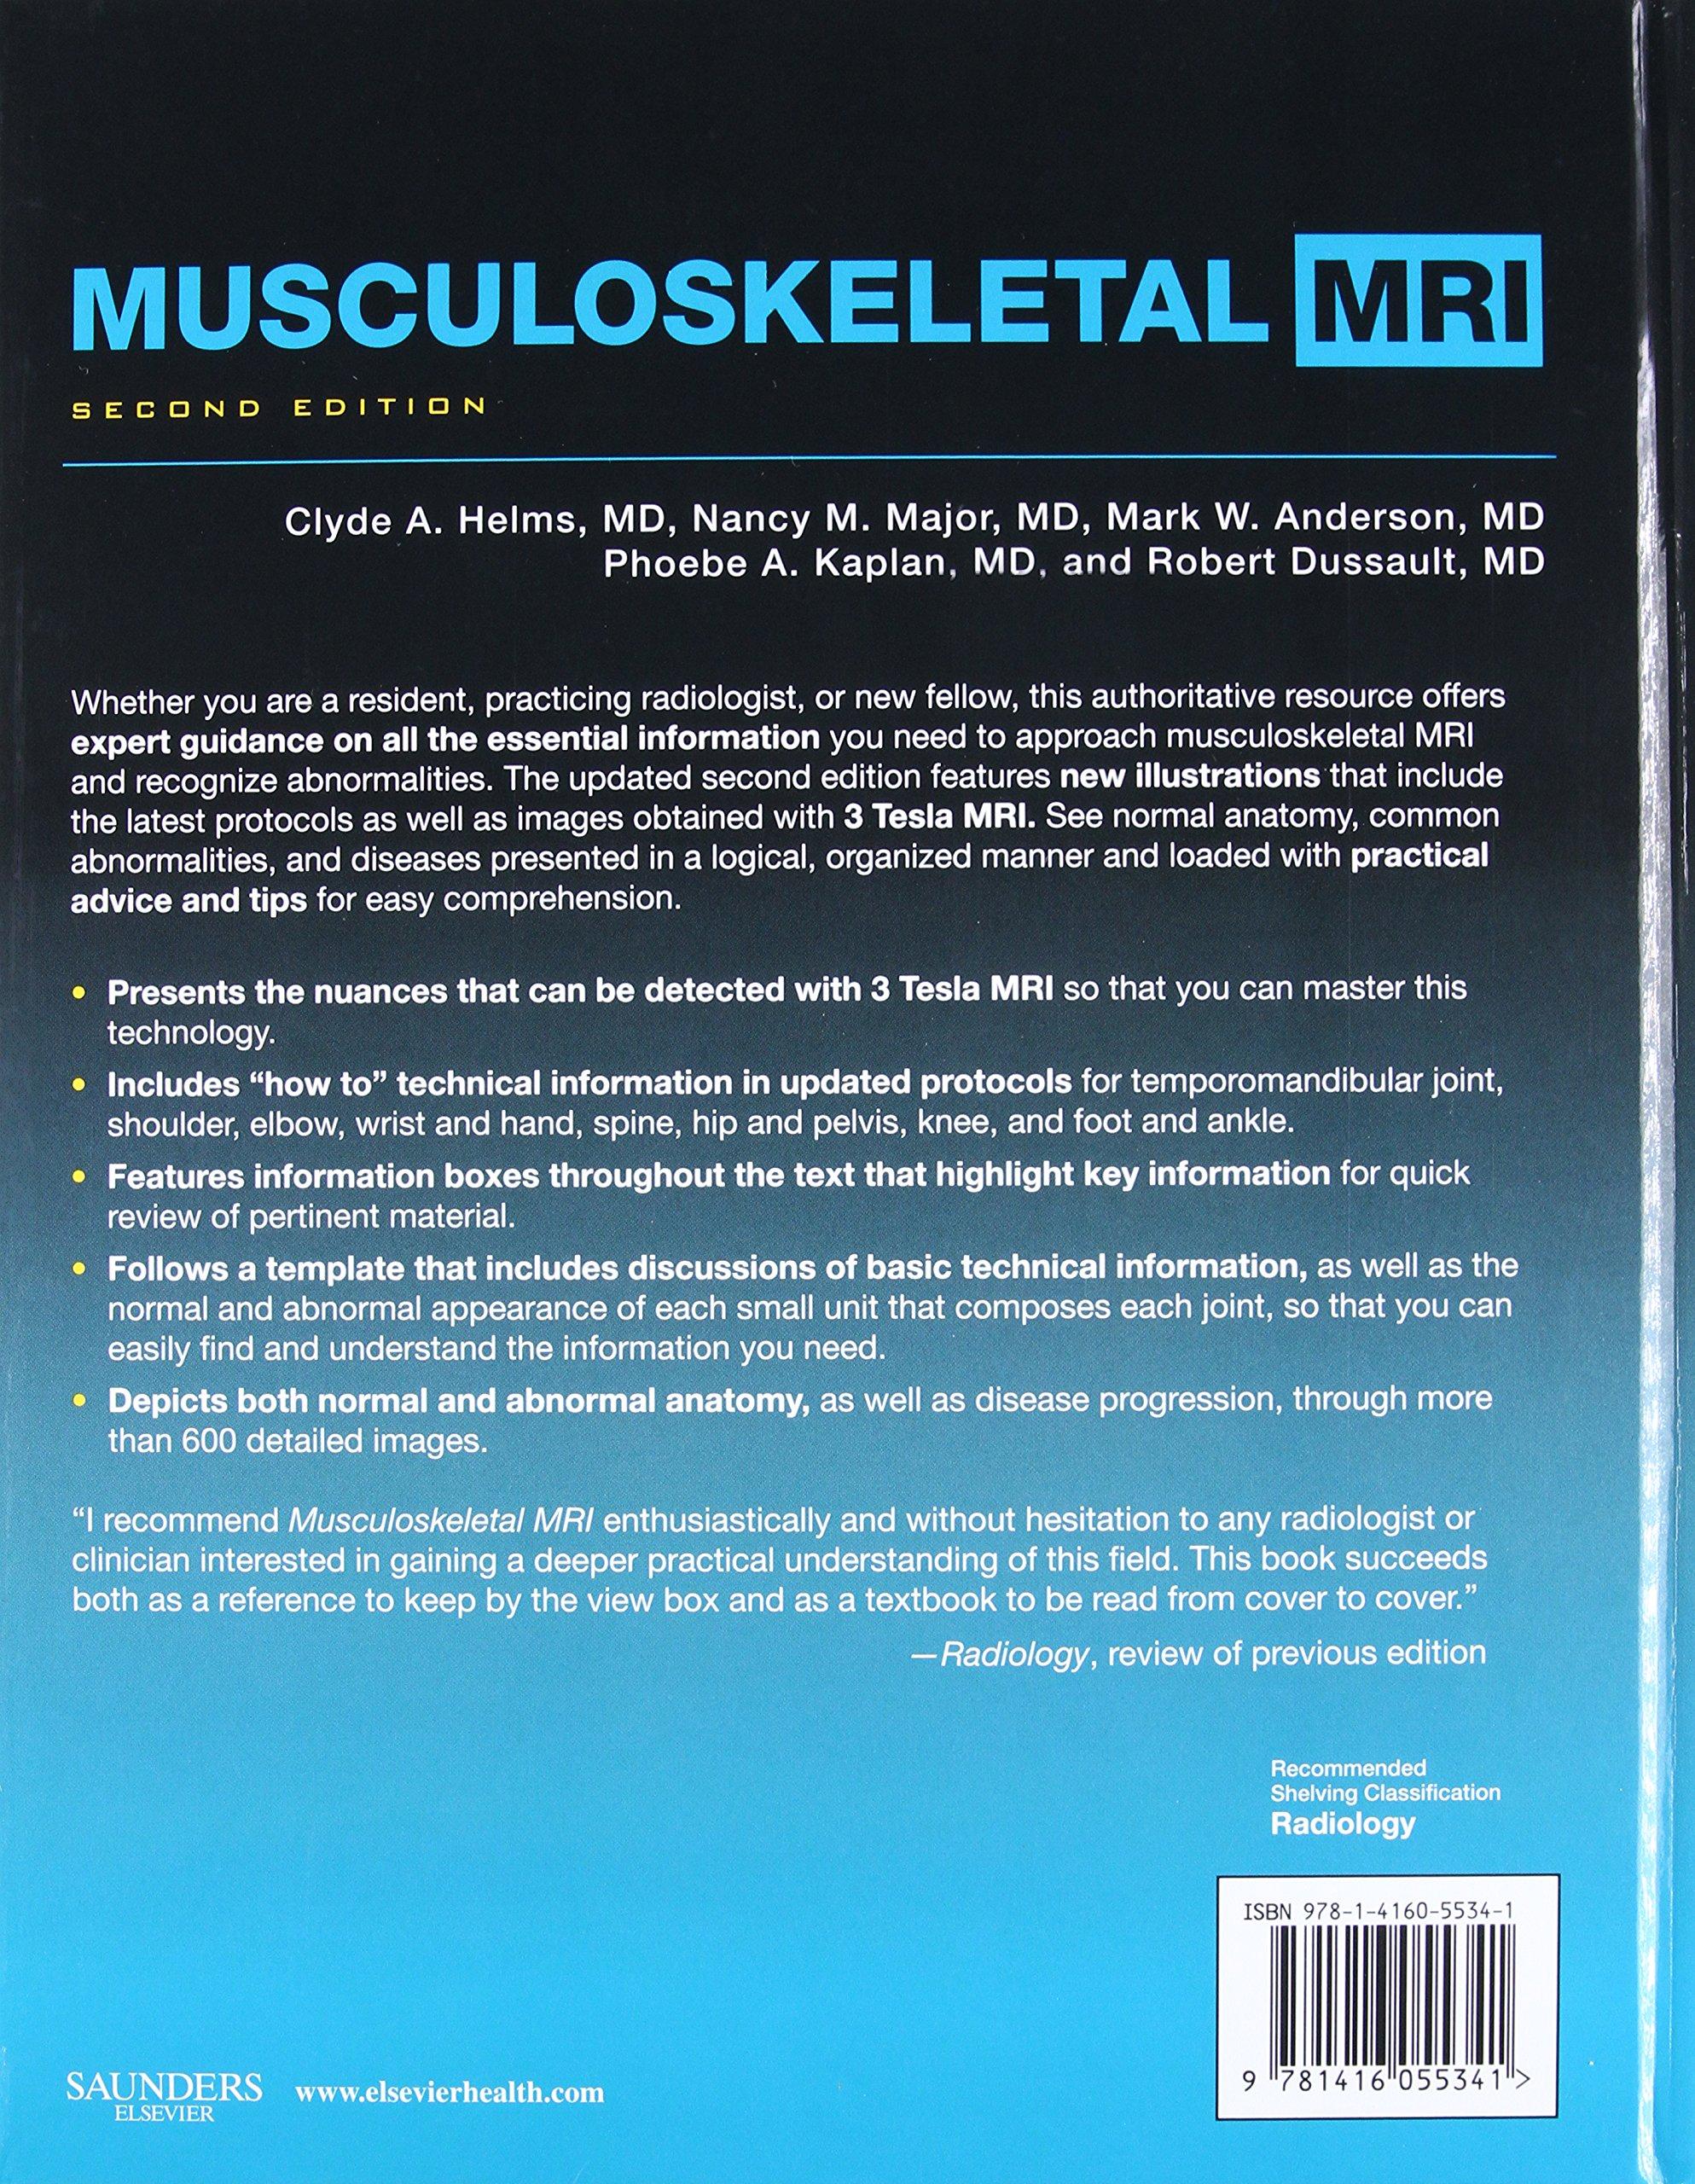 Musculoskeletal MRI, 2e: Amazon.co.uk: Clyde A. Helms MD, Nancy M ...